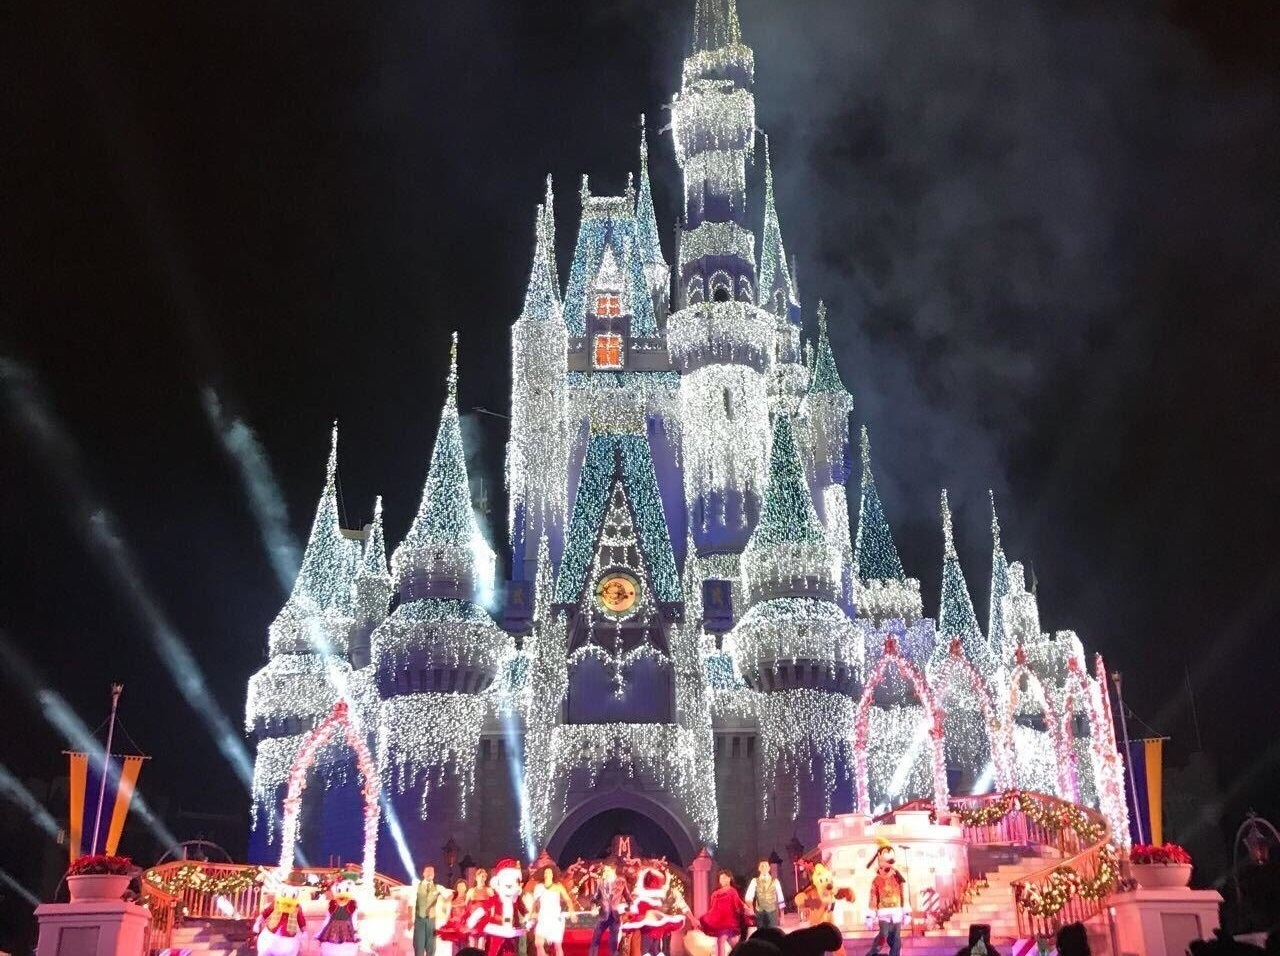 Mickey's Very Merry Christmas Party – A Festa de Natal Mágica da Disney